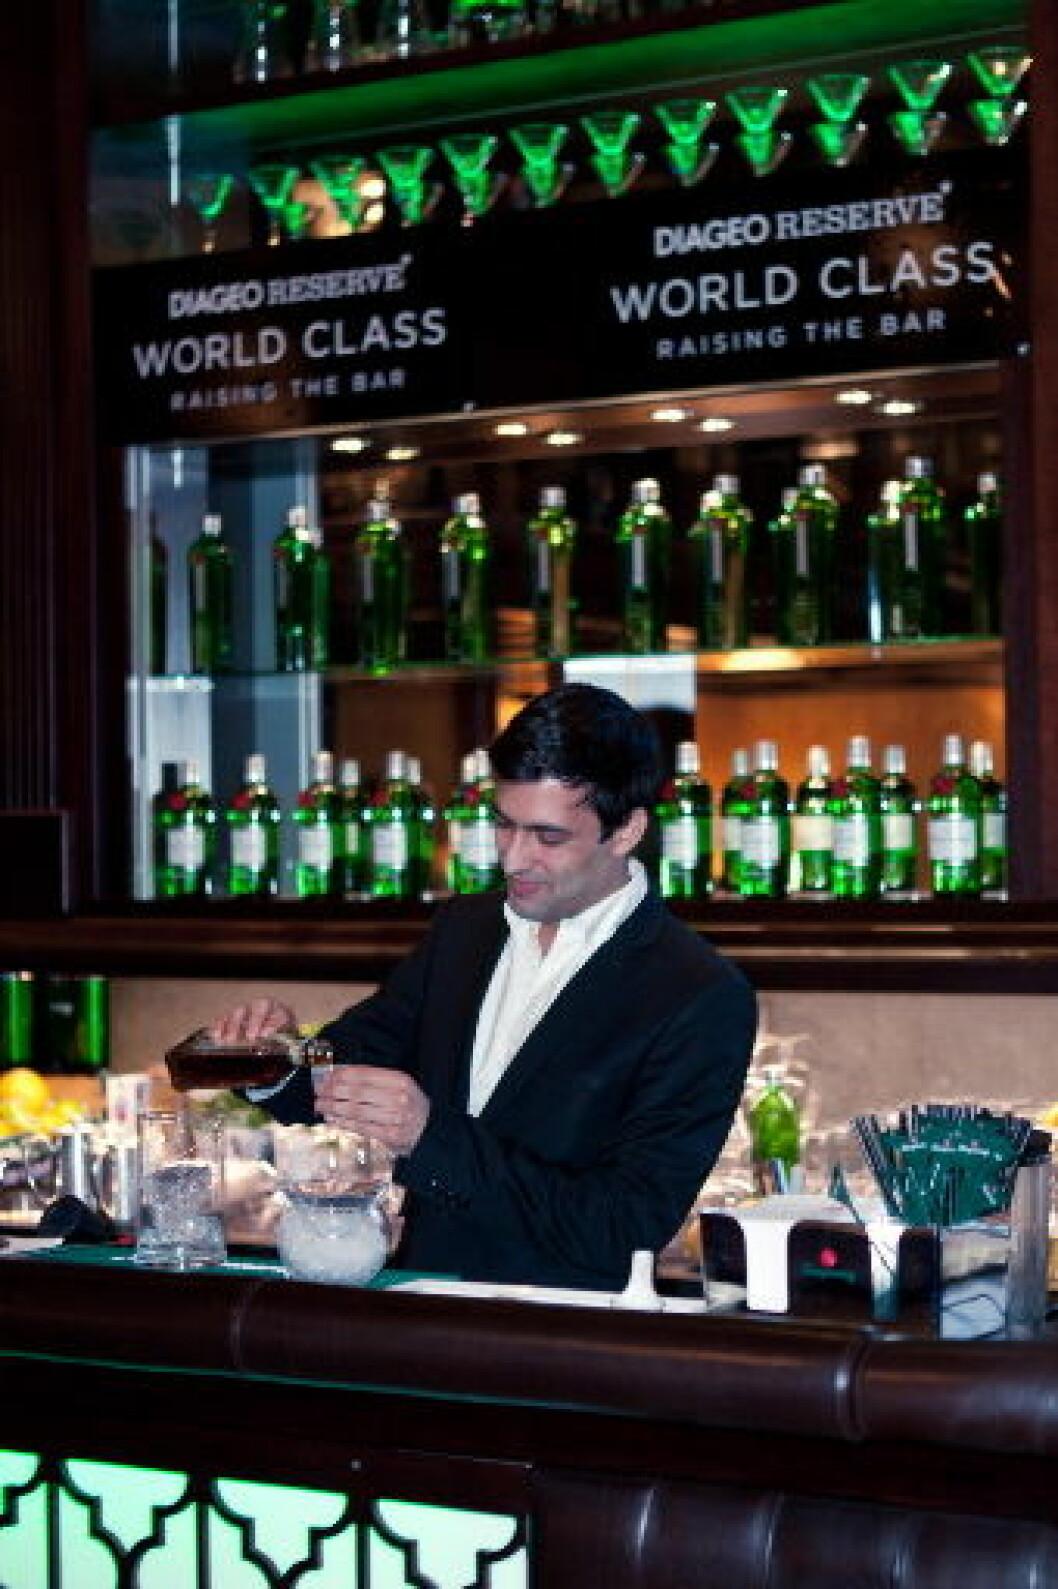 World Class Alexandre Pereira Puas